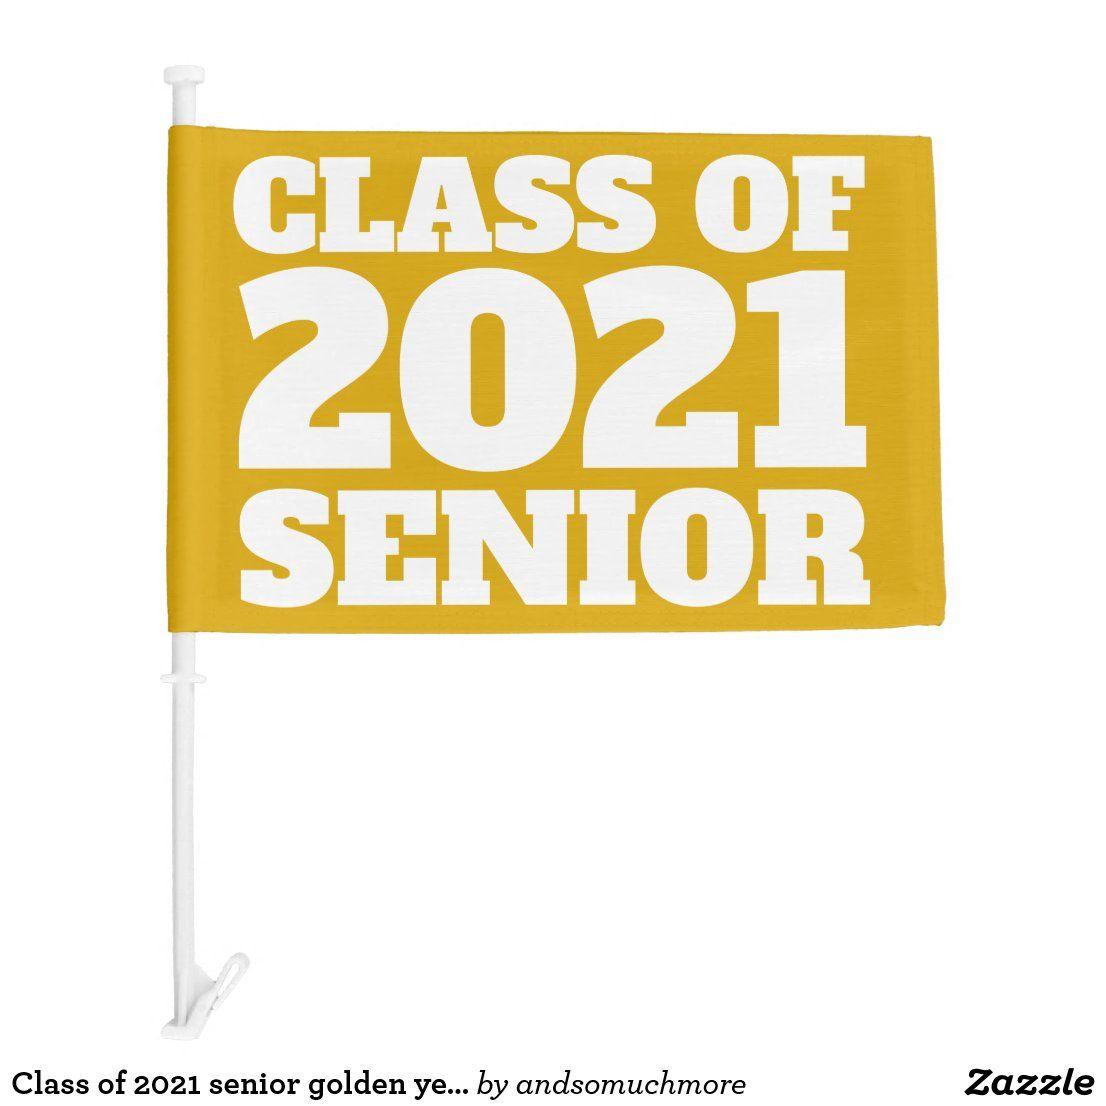 Class of 2021 senior golden yellow car flag